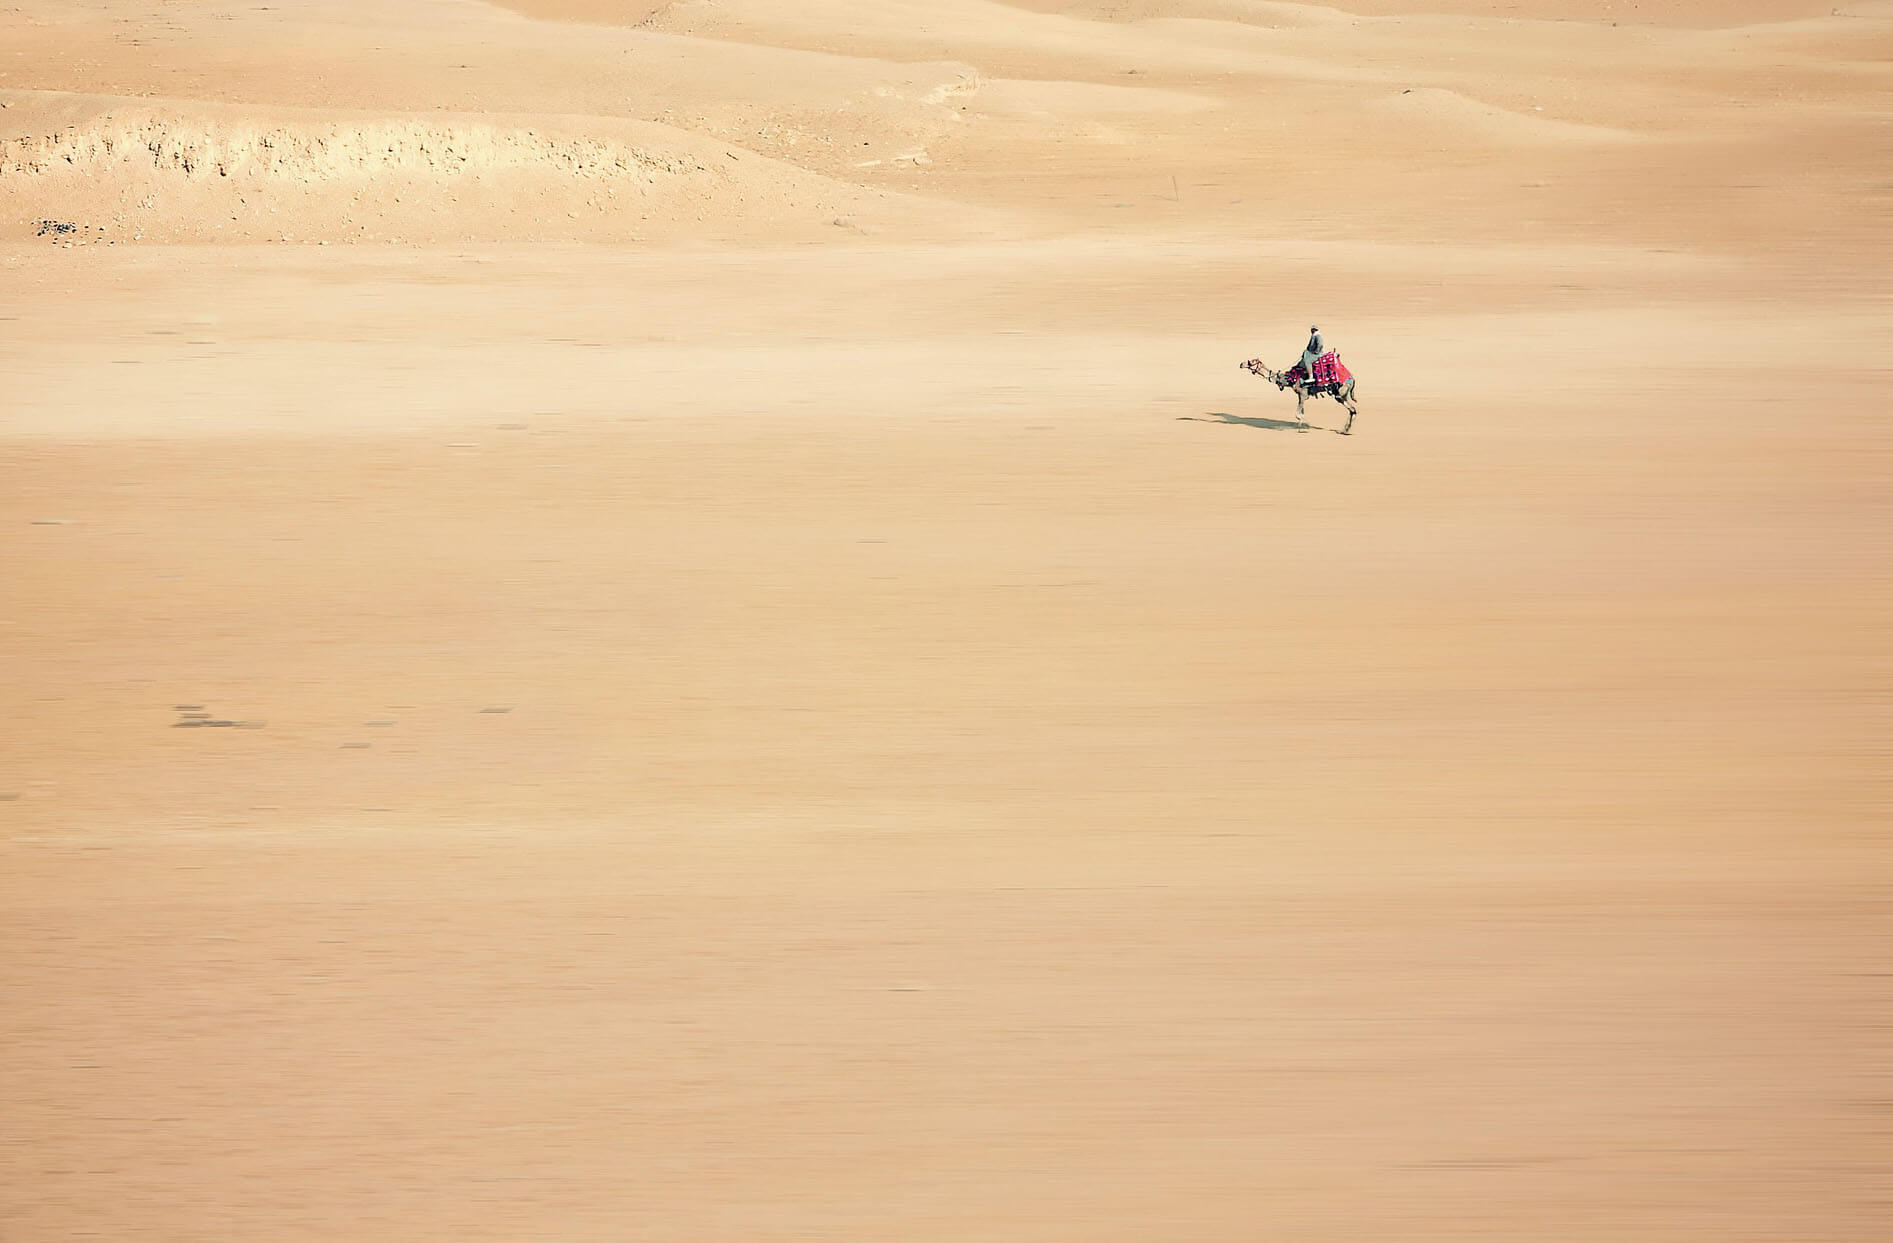 Mujeres viajeras, desierto